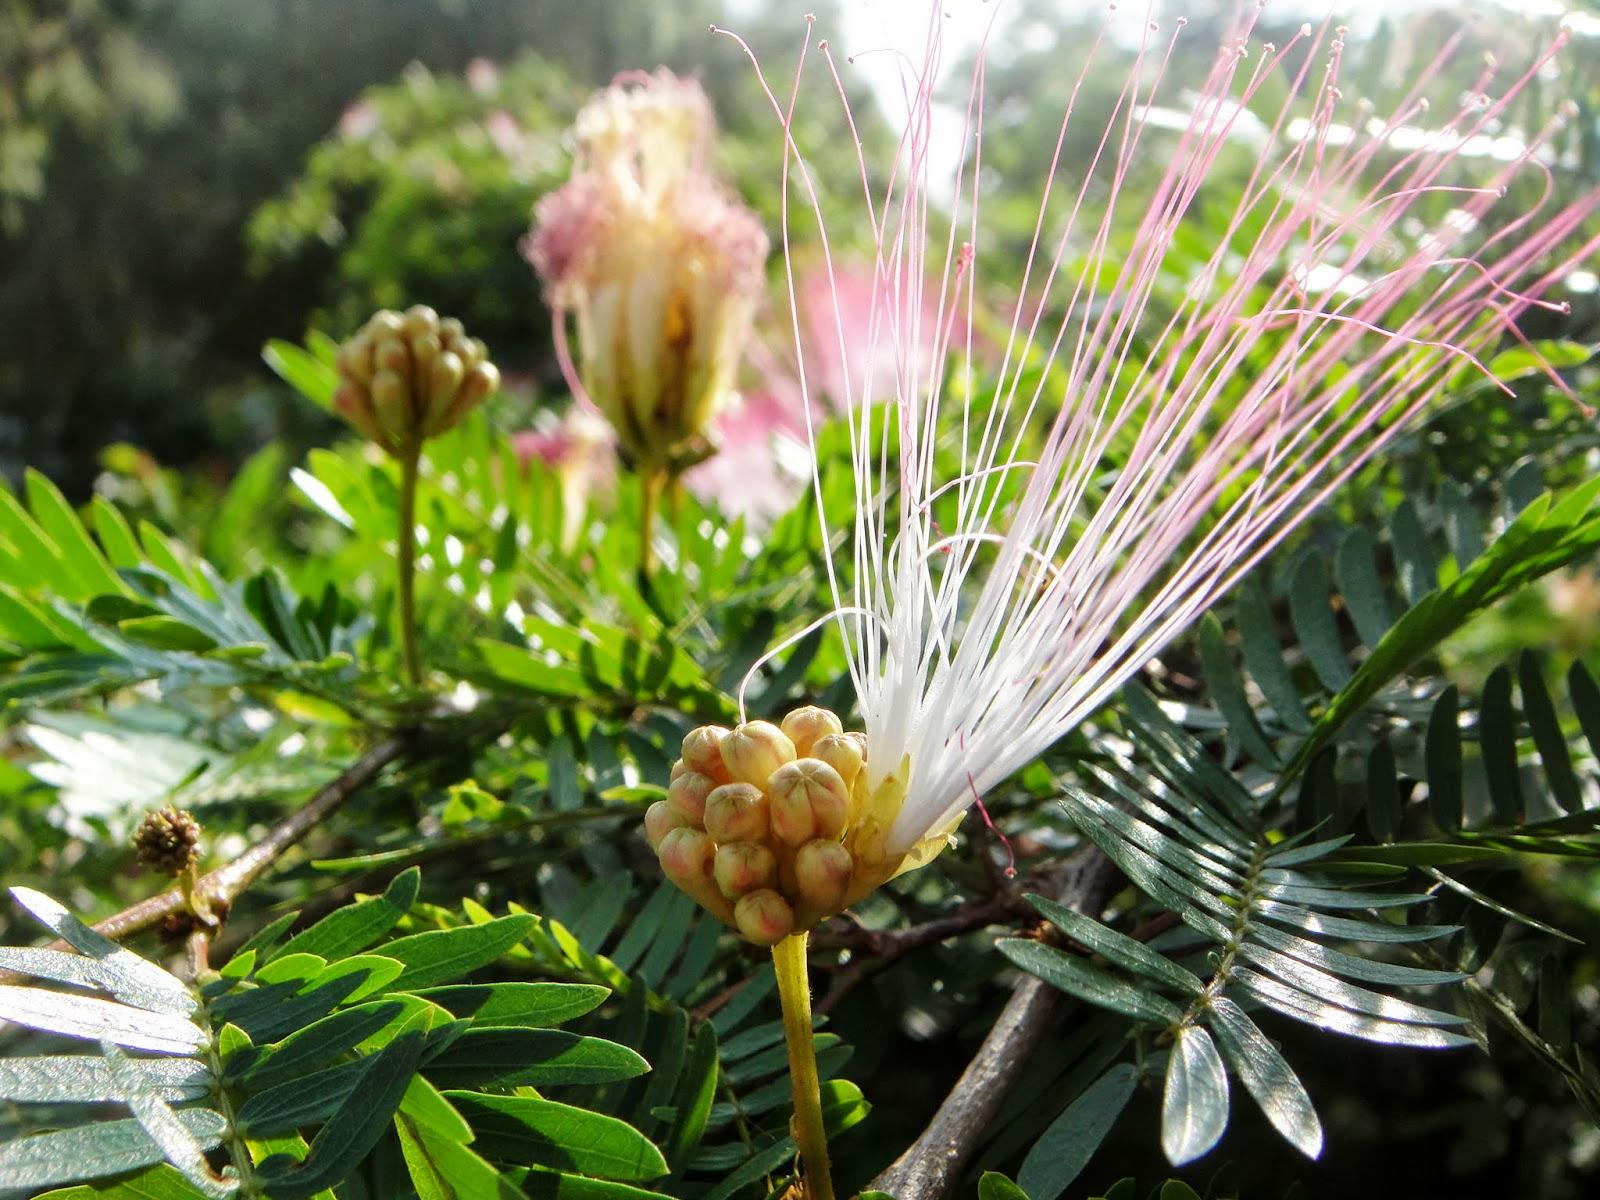 DWAN雲之端: 粉撲花--花語是:心靈的秘密;學名:Calliandra surinamensis Benth.;英文名:Surinam Calliandra;又叫:粉紅 ...